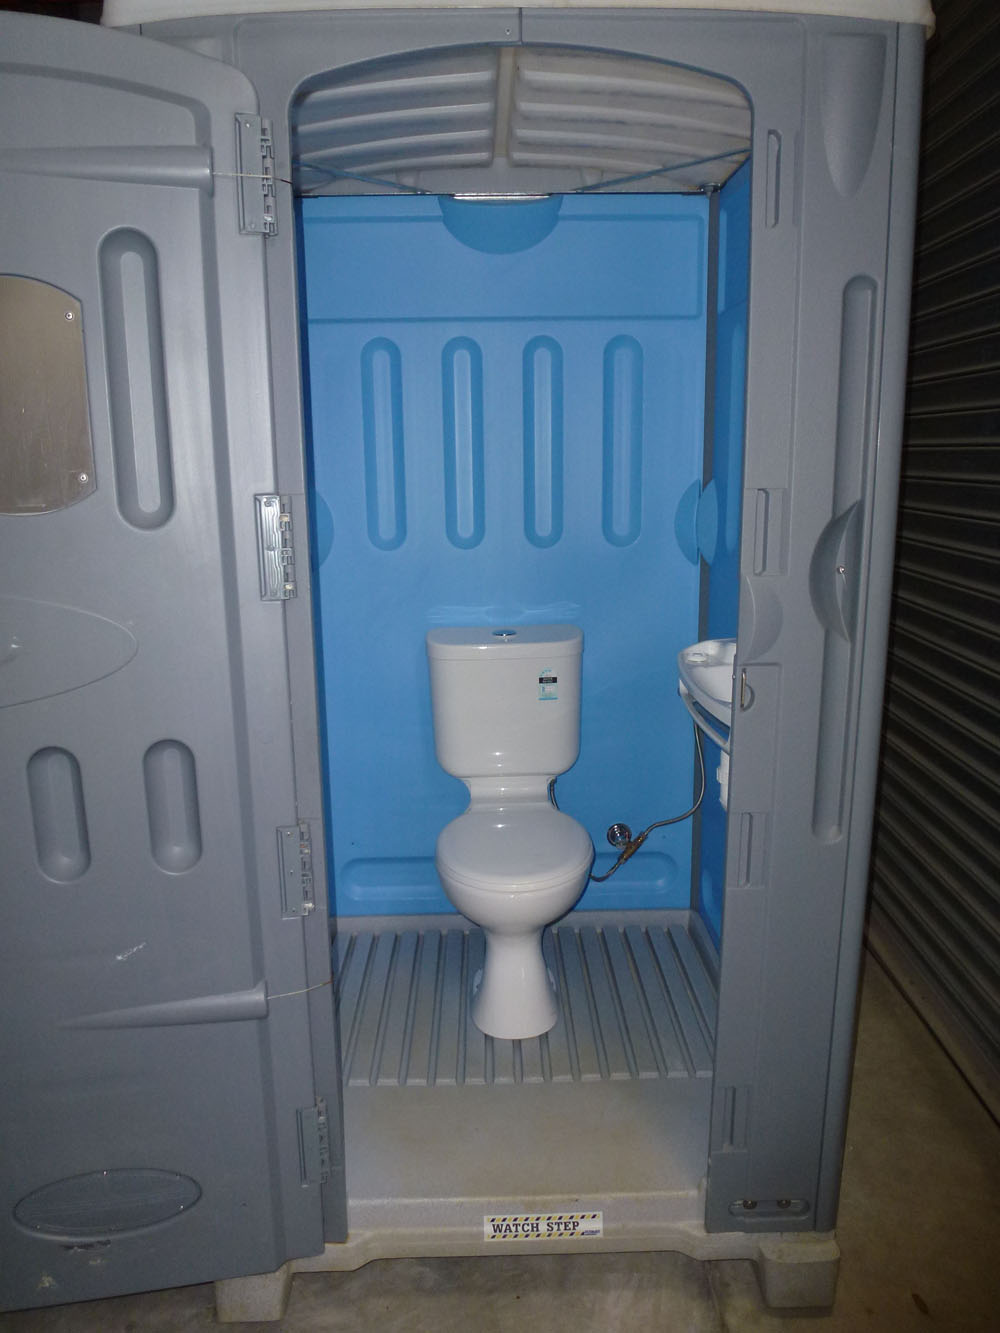 Urinal hookup